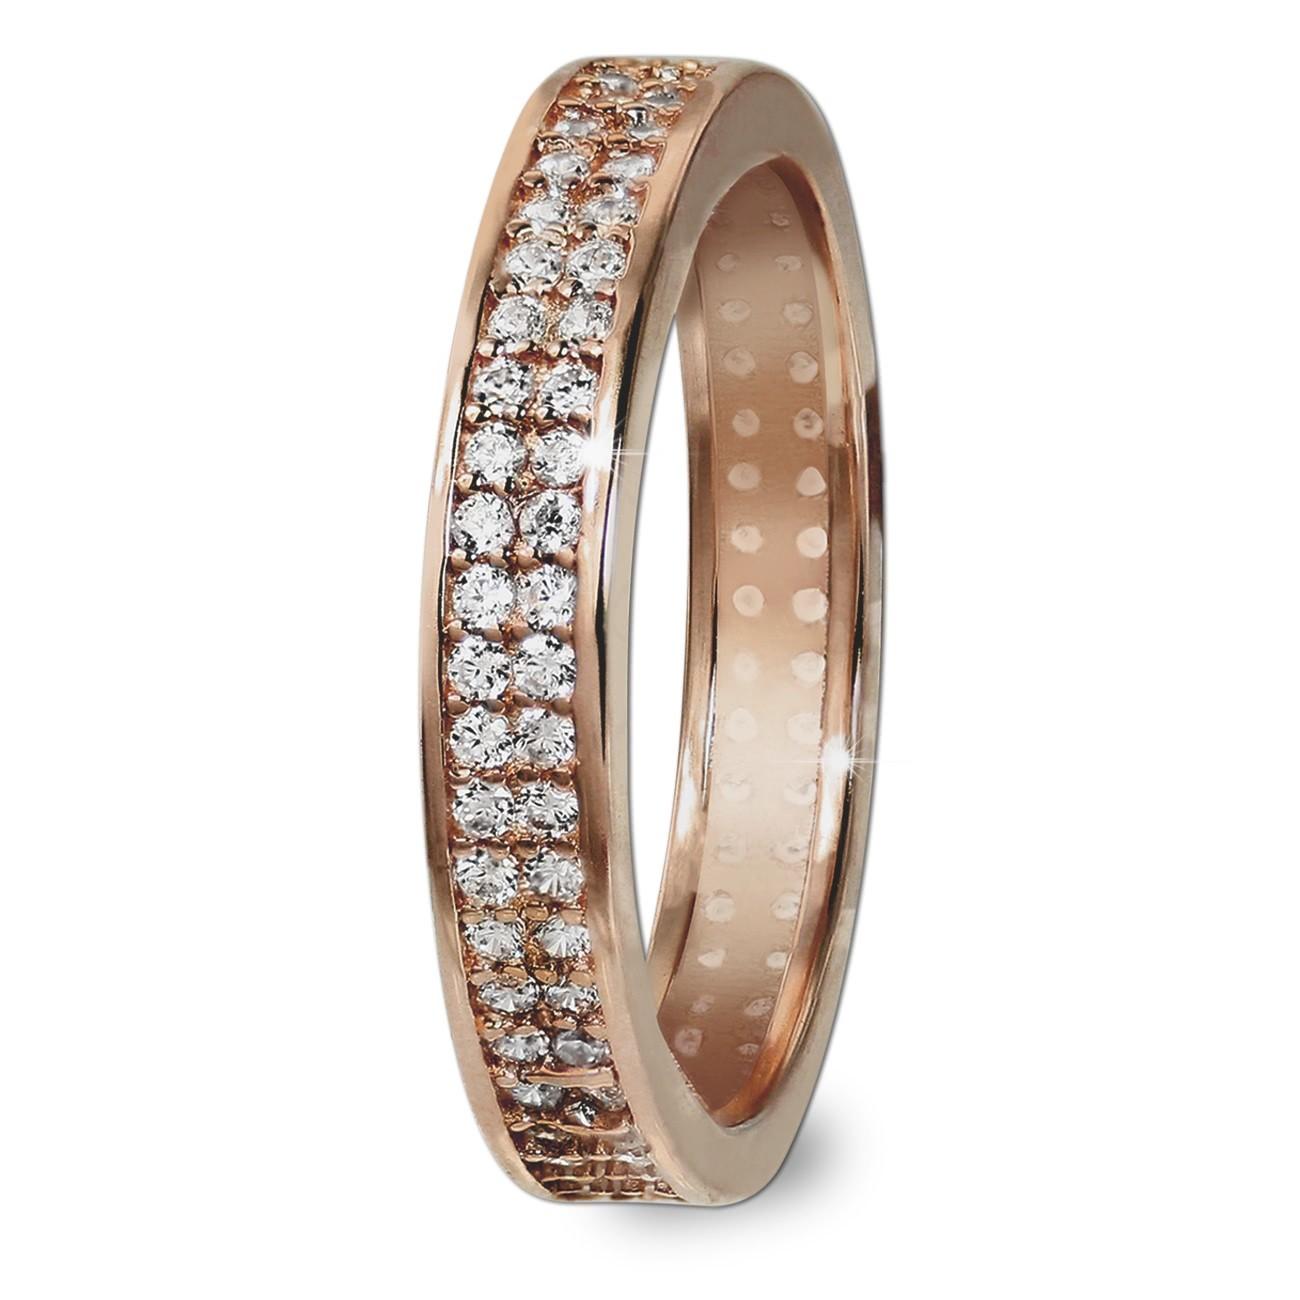 GoldDream Gold Ring Gr.58 Zirkonia weiß 333er Rosegold GDR514E58